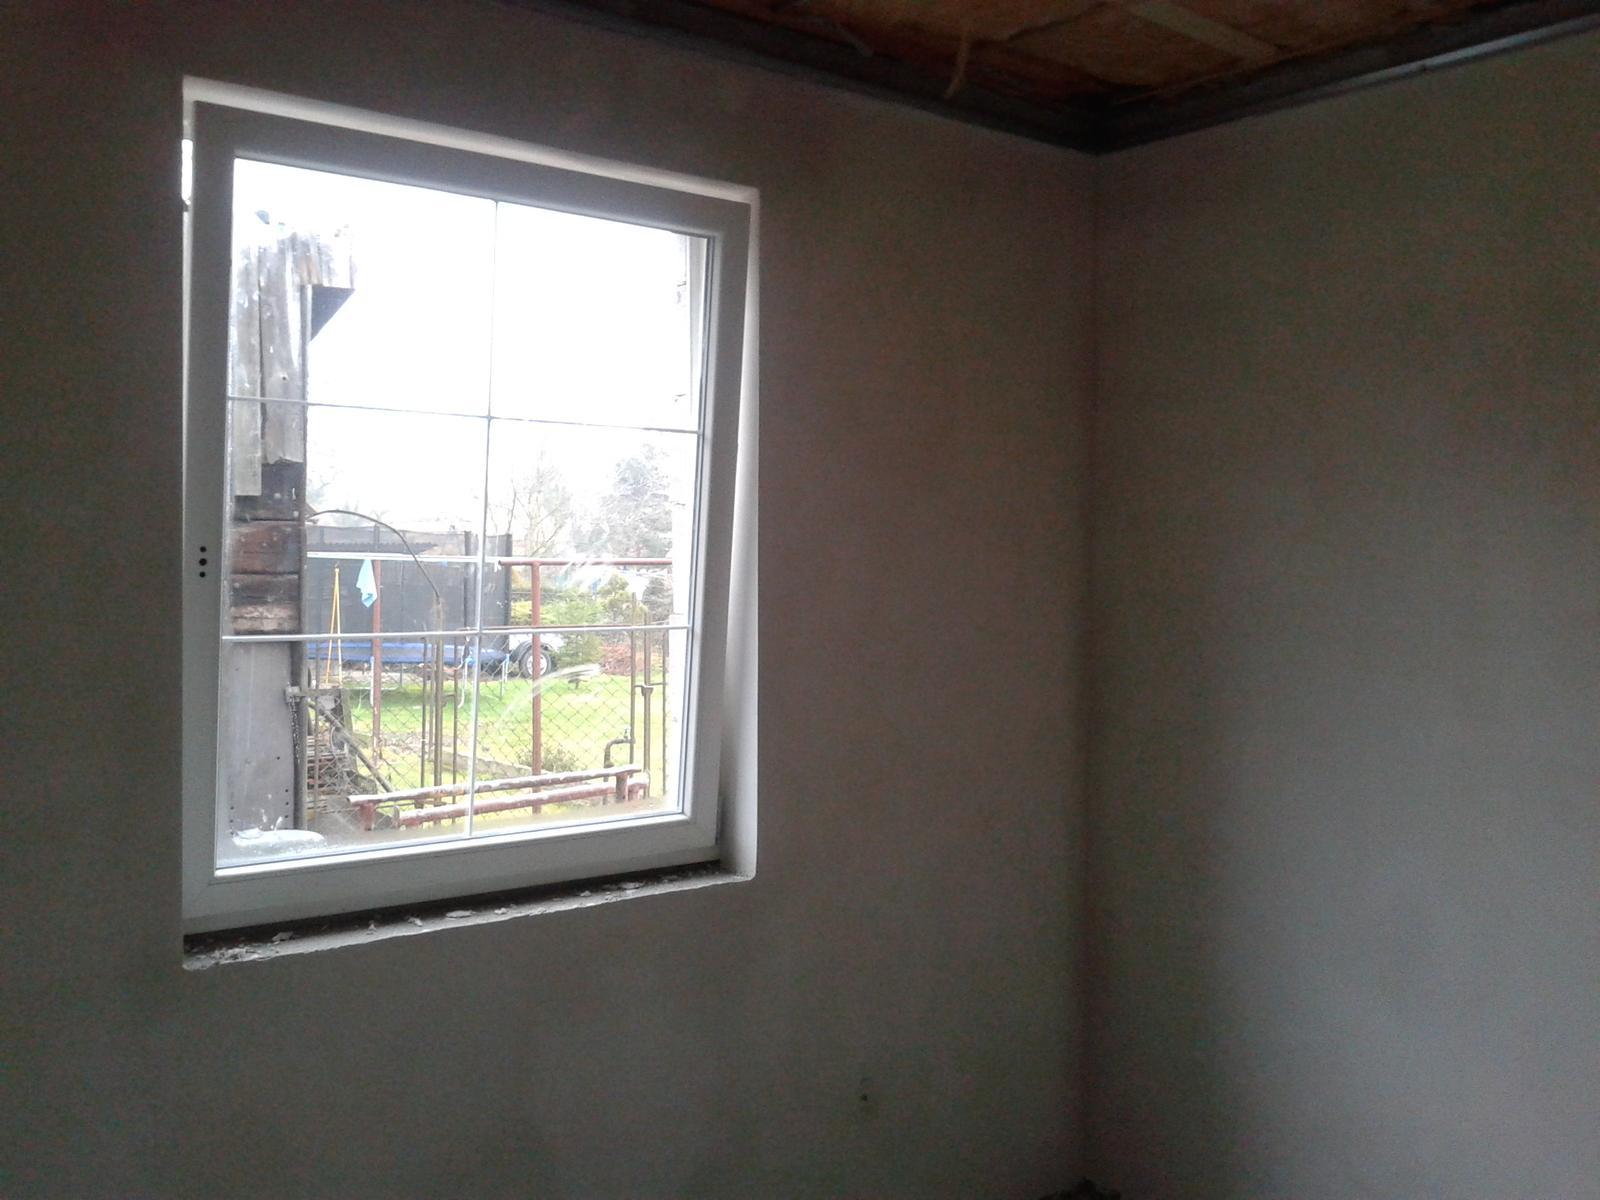 Domeček rekonstruujeme pro rodiče - Štuky v pokoji